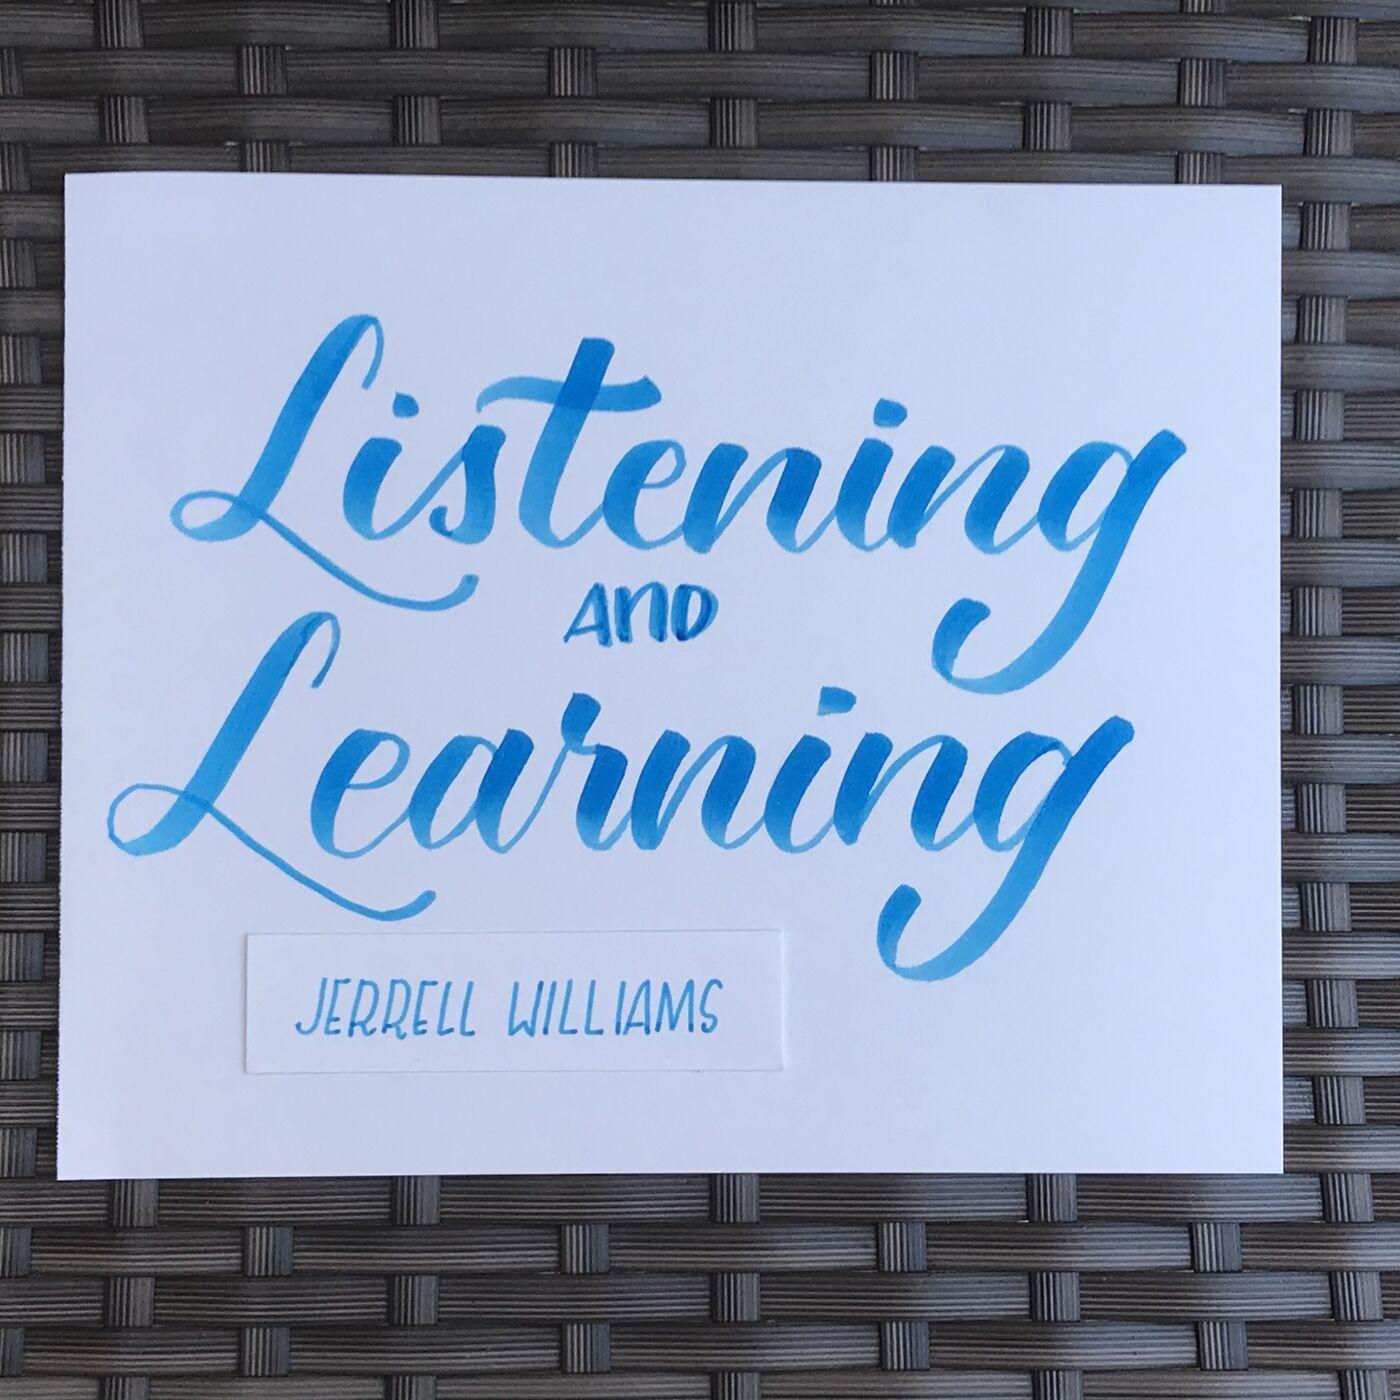 Listening & Learning: Jerrell Williams